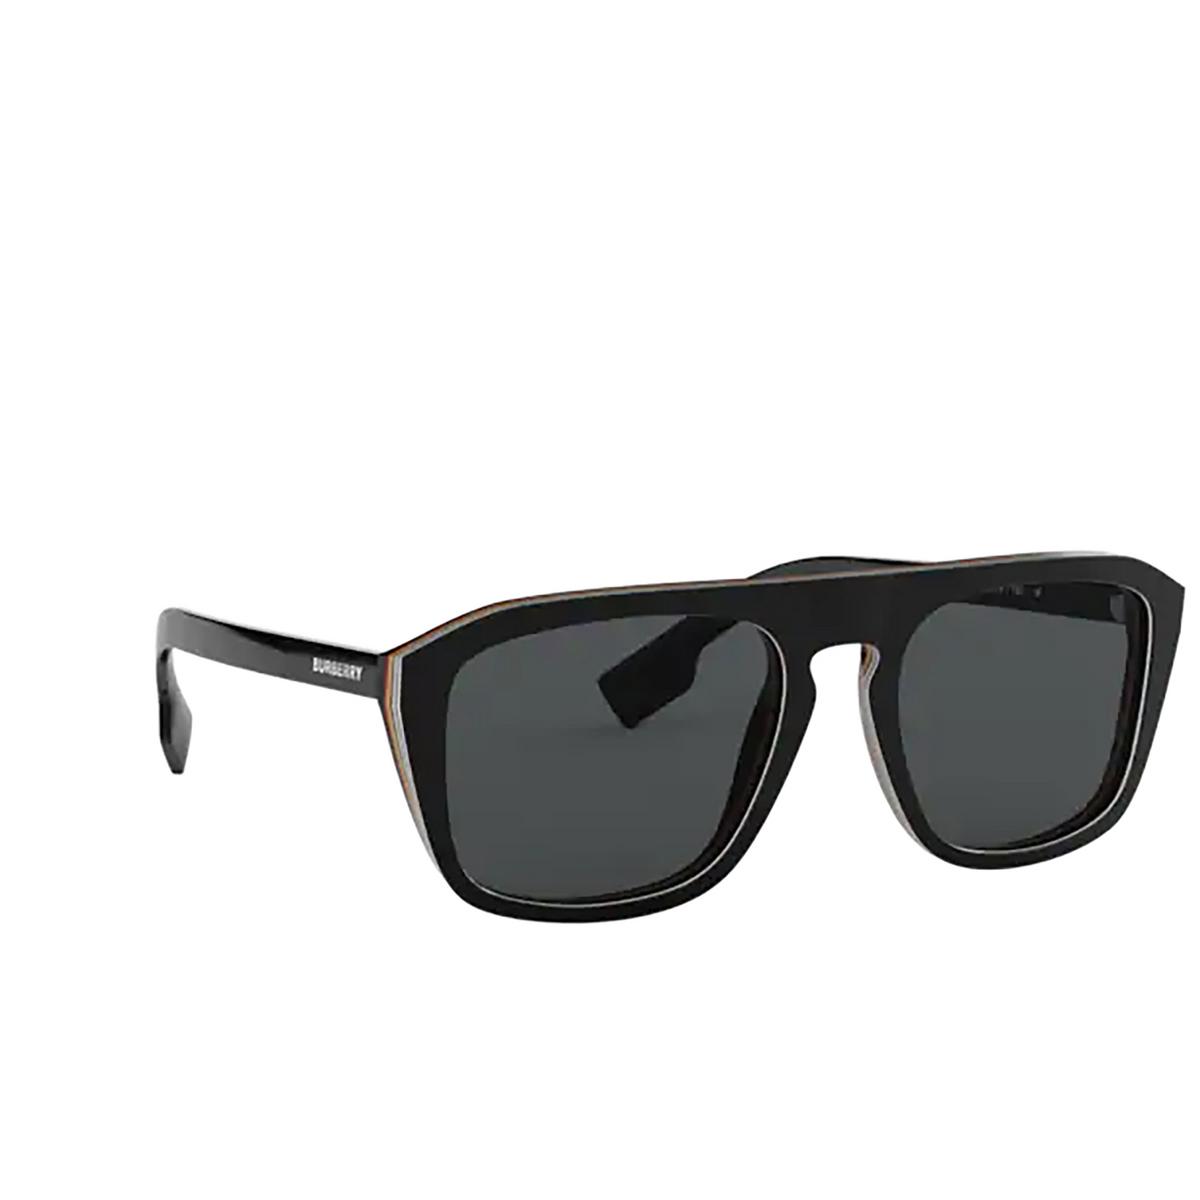 Burberry® Square Sunglasses: BE4286 color Check Multilayer Black 379881 - three-quarters view.